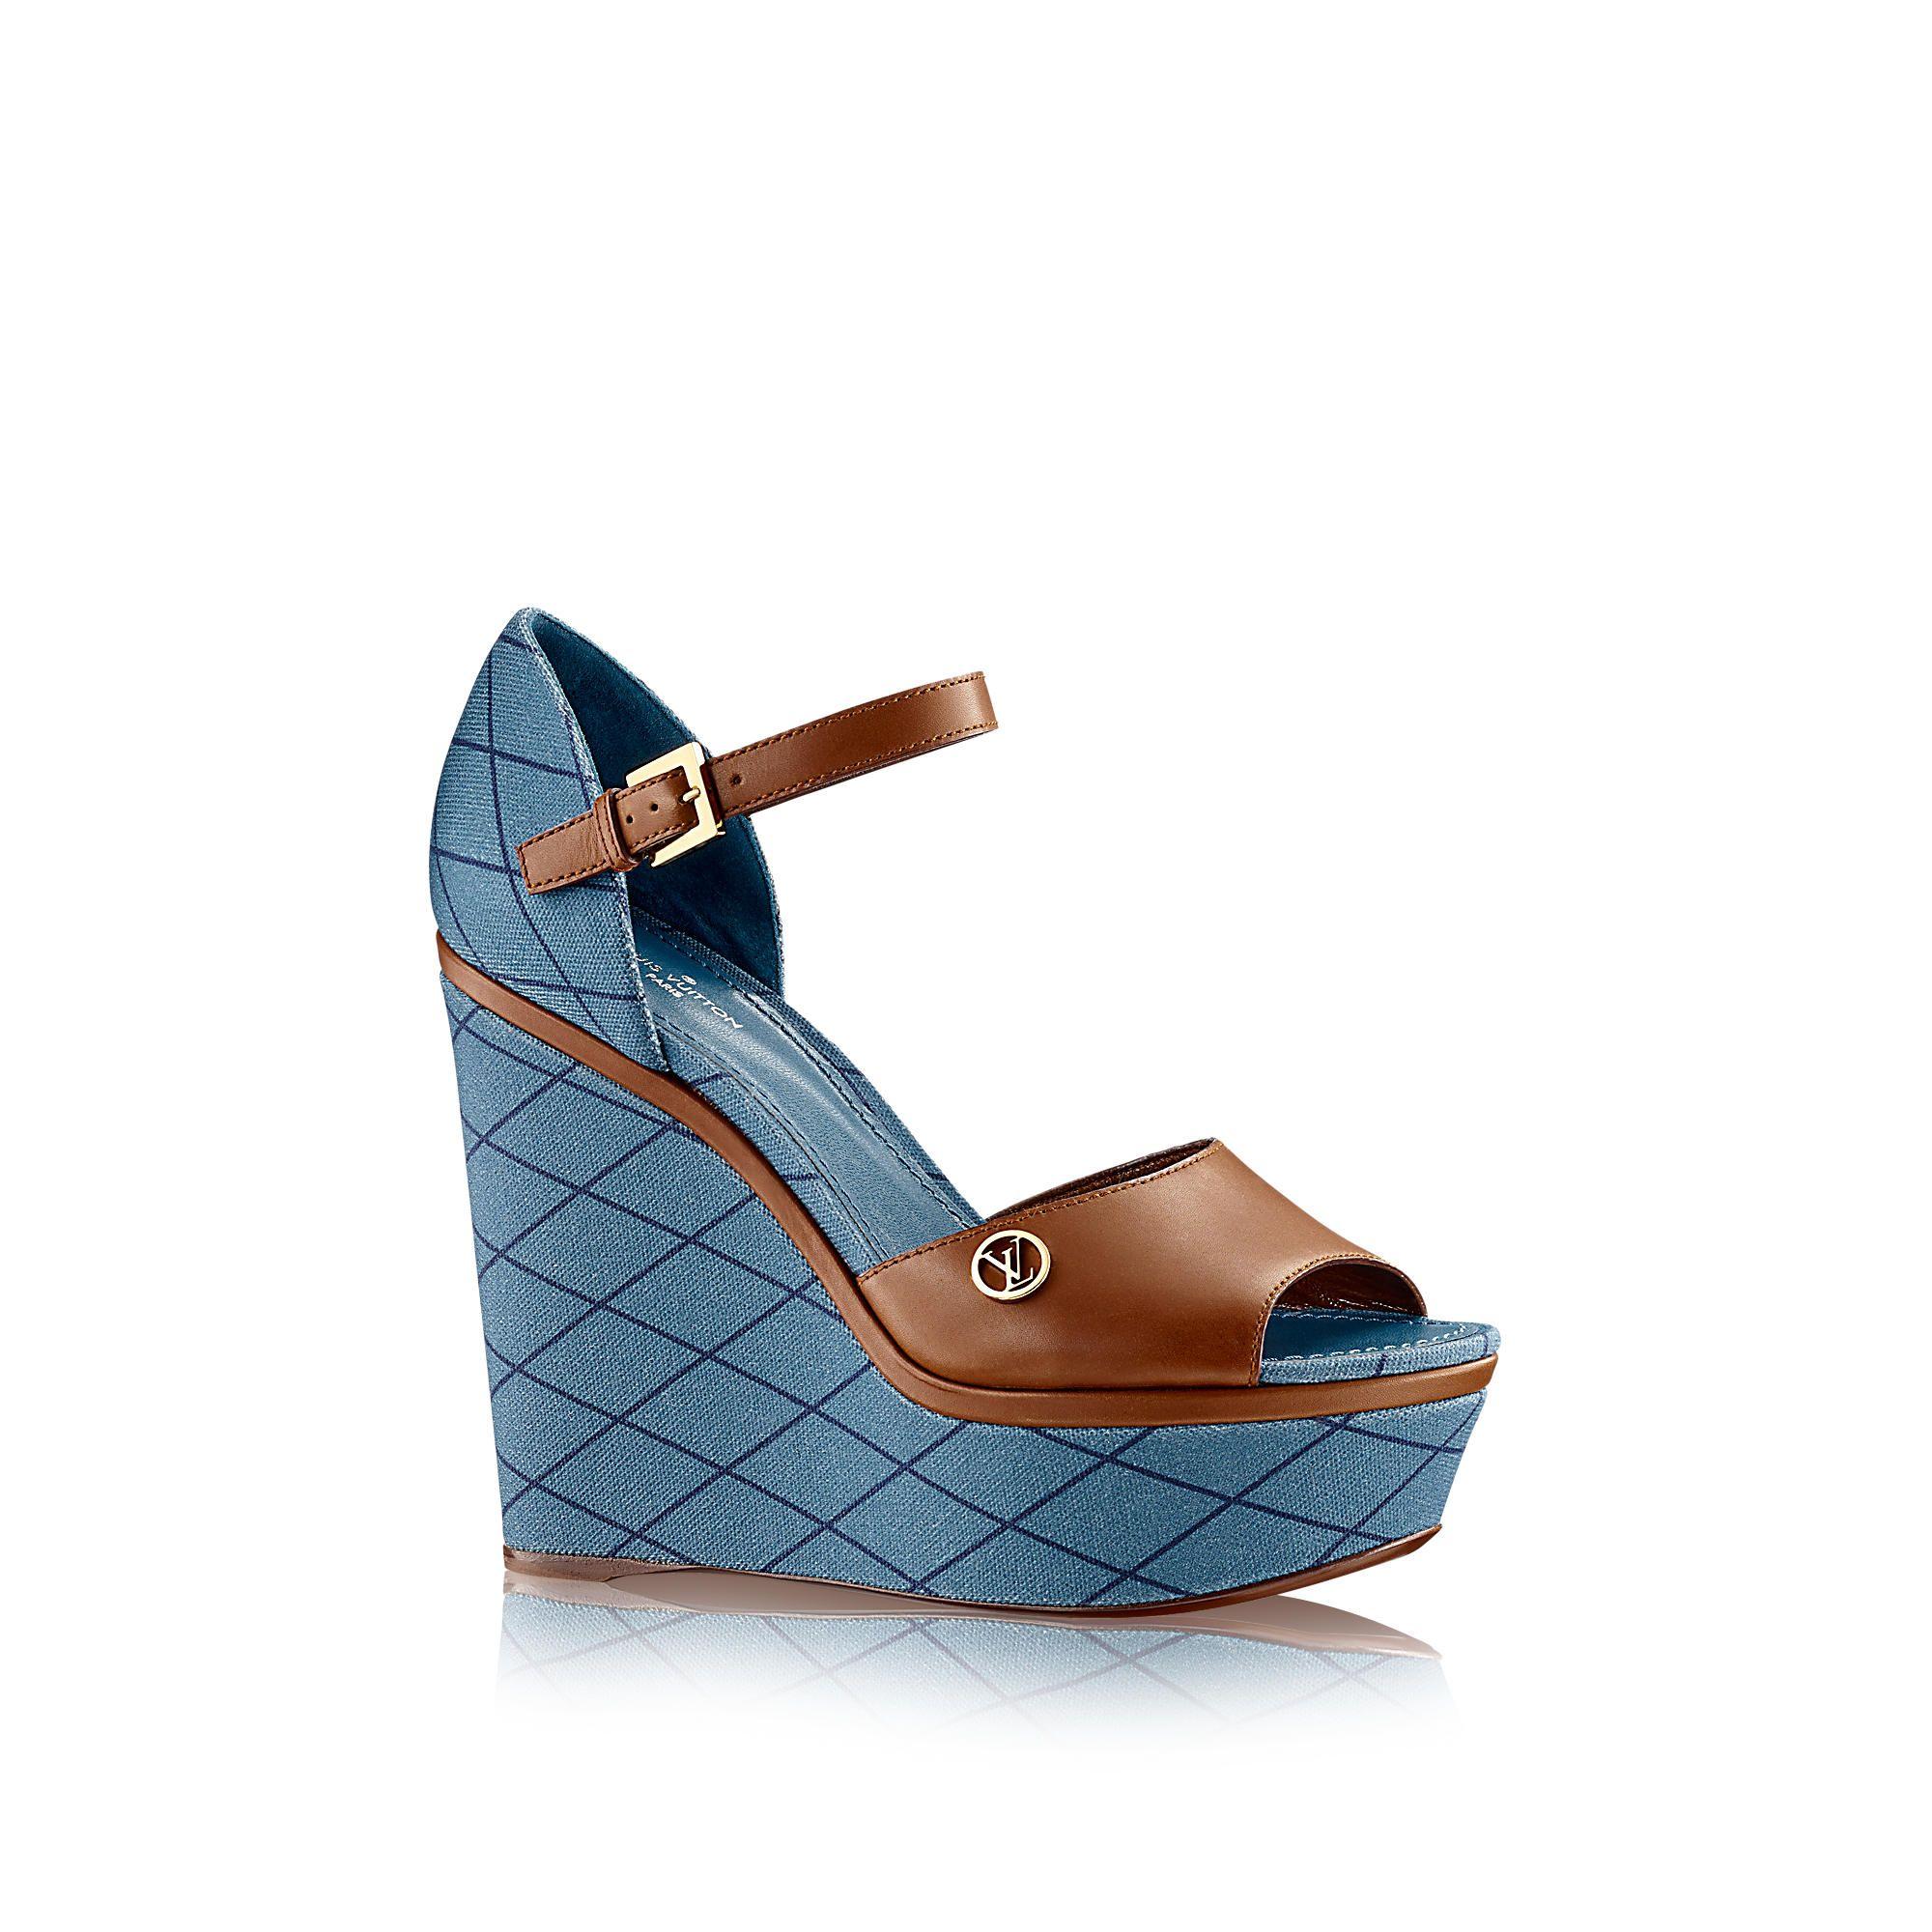 1d38adf6bc91 Discover Louis Vuitton Blossom Sandal via Louis Vuitton